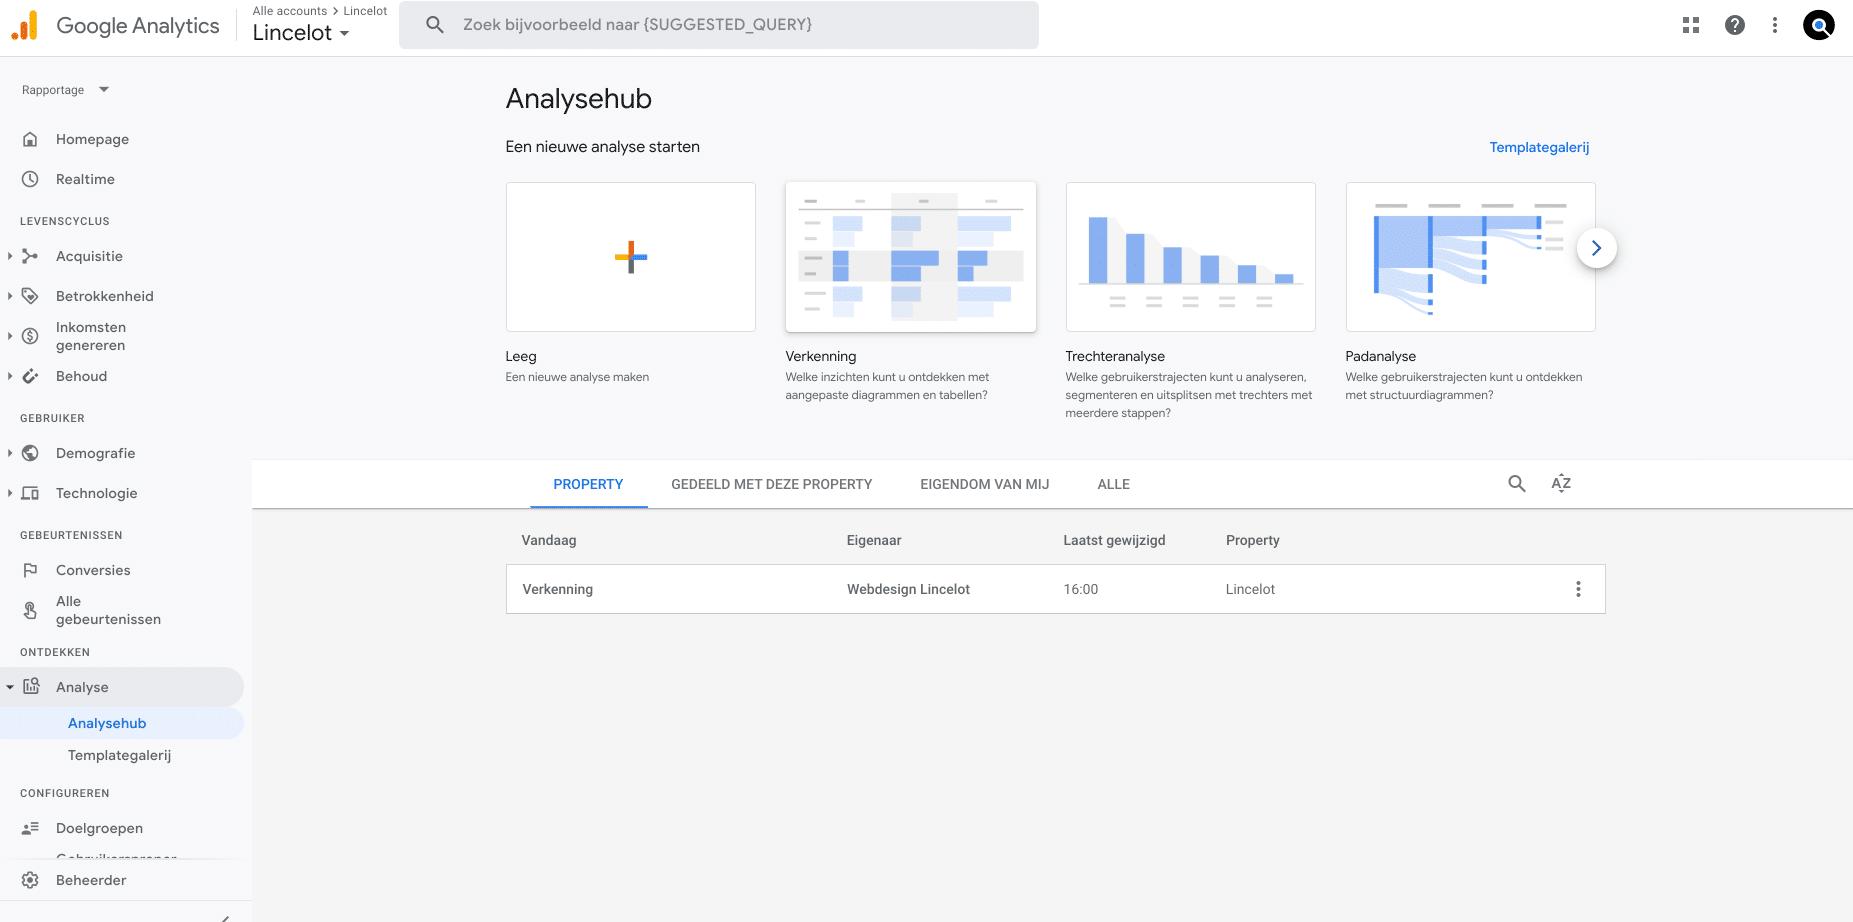 schermafbeelding google analytics 4 - Lincelot - analysehub